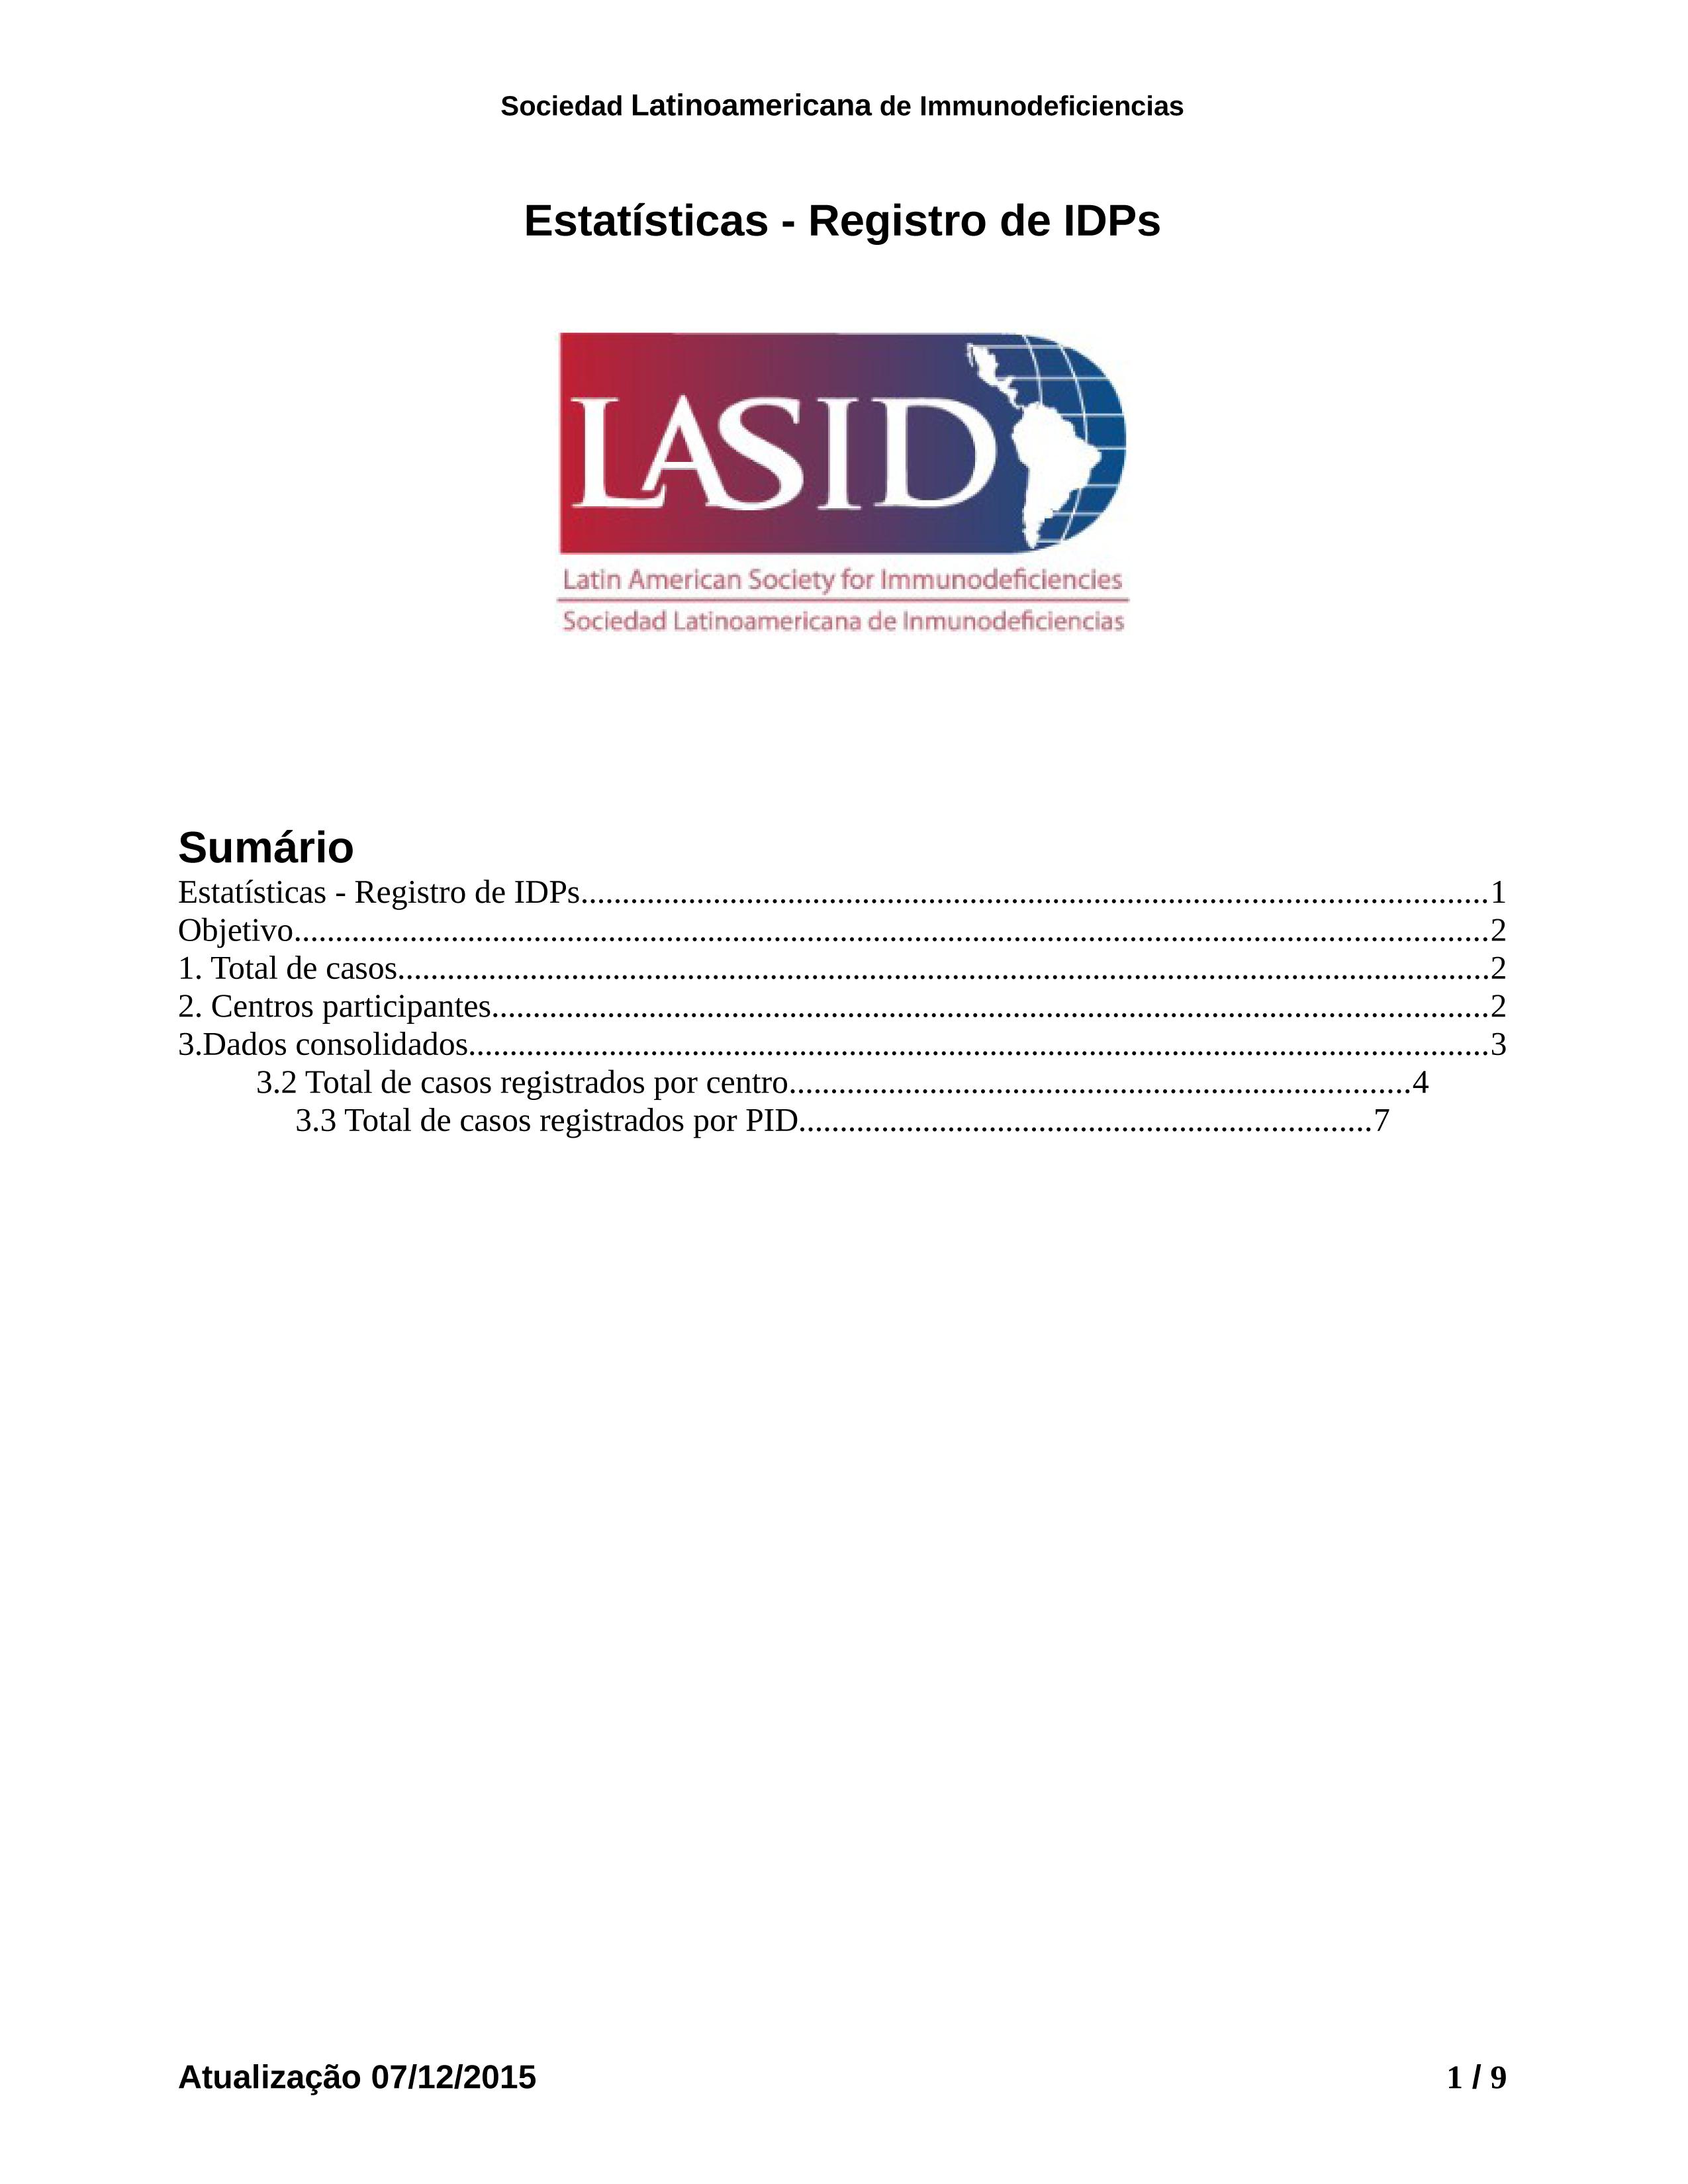 Estatisticas_LASID-2015-Dez-1